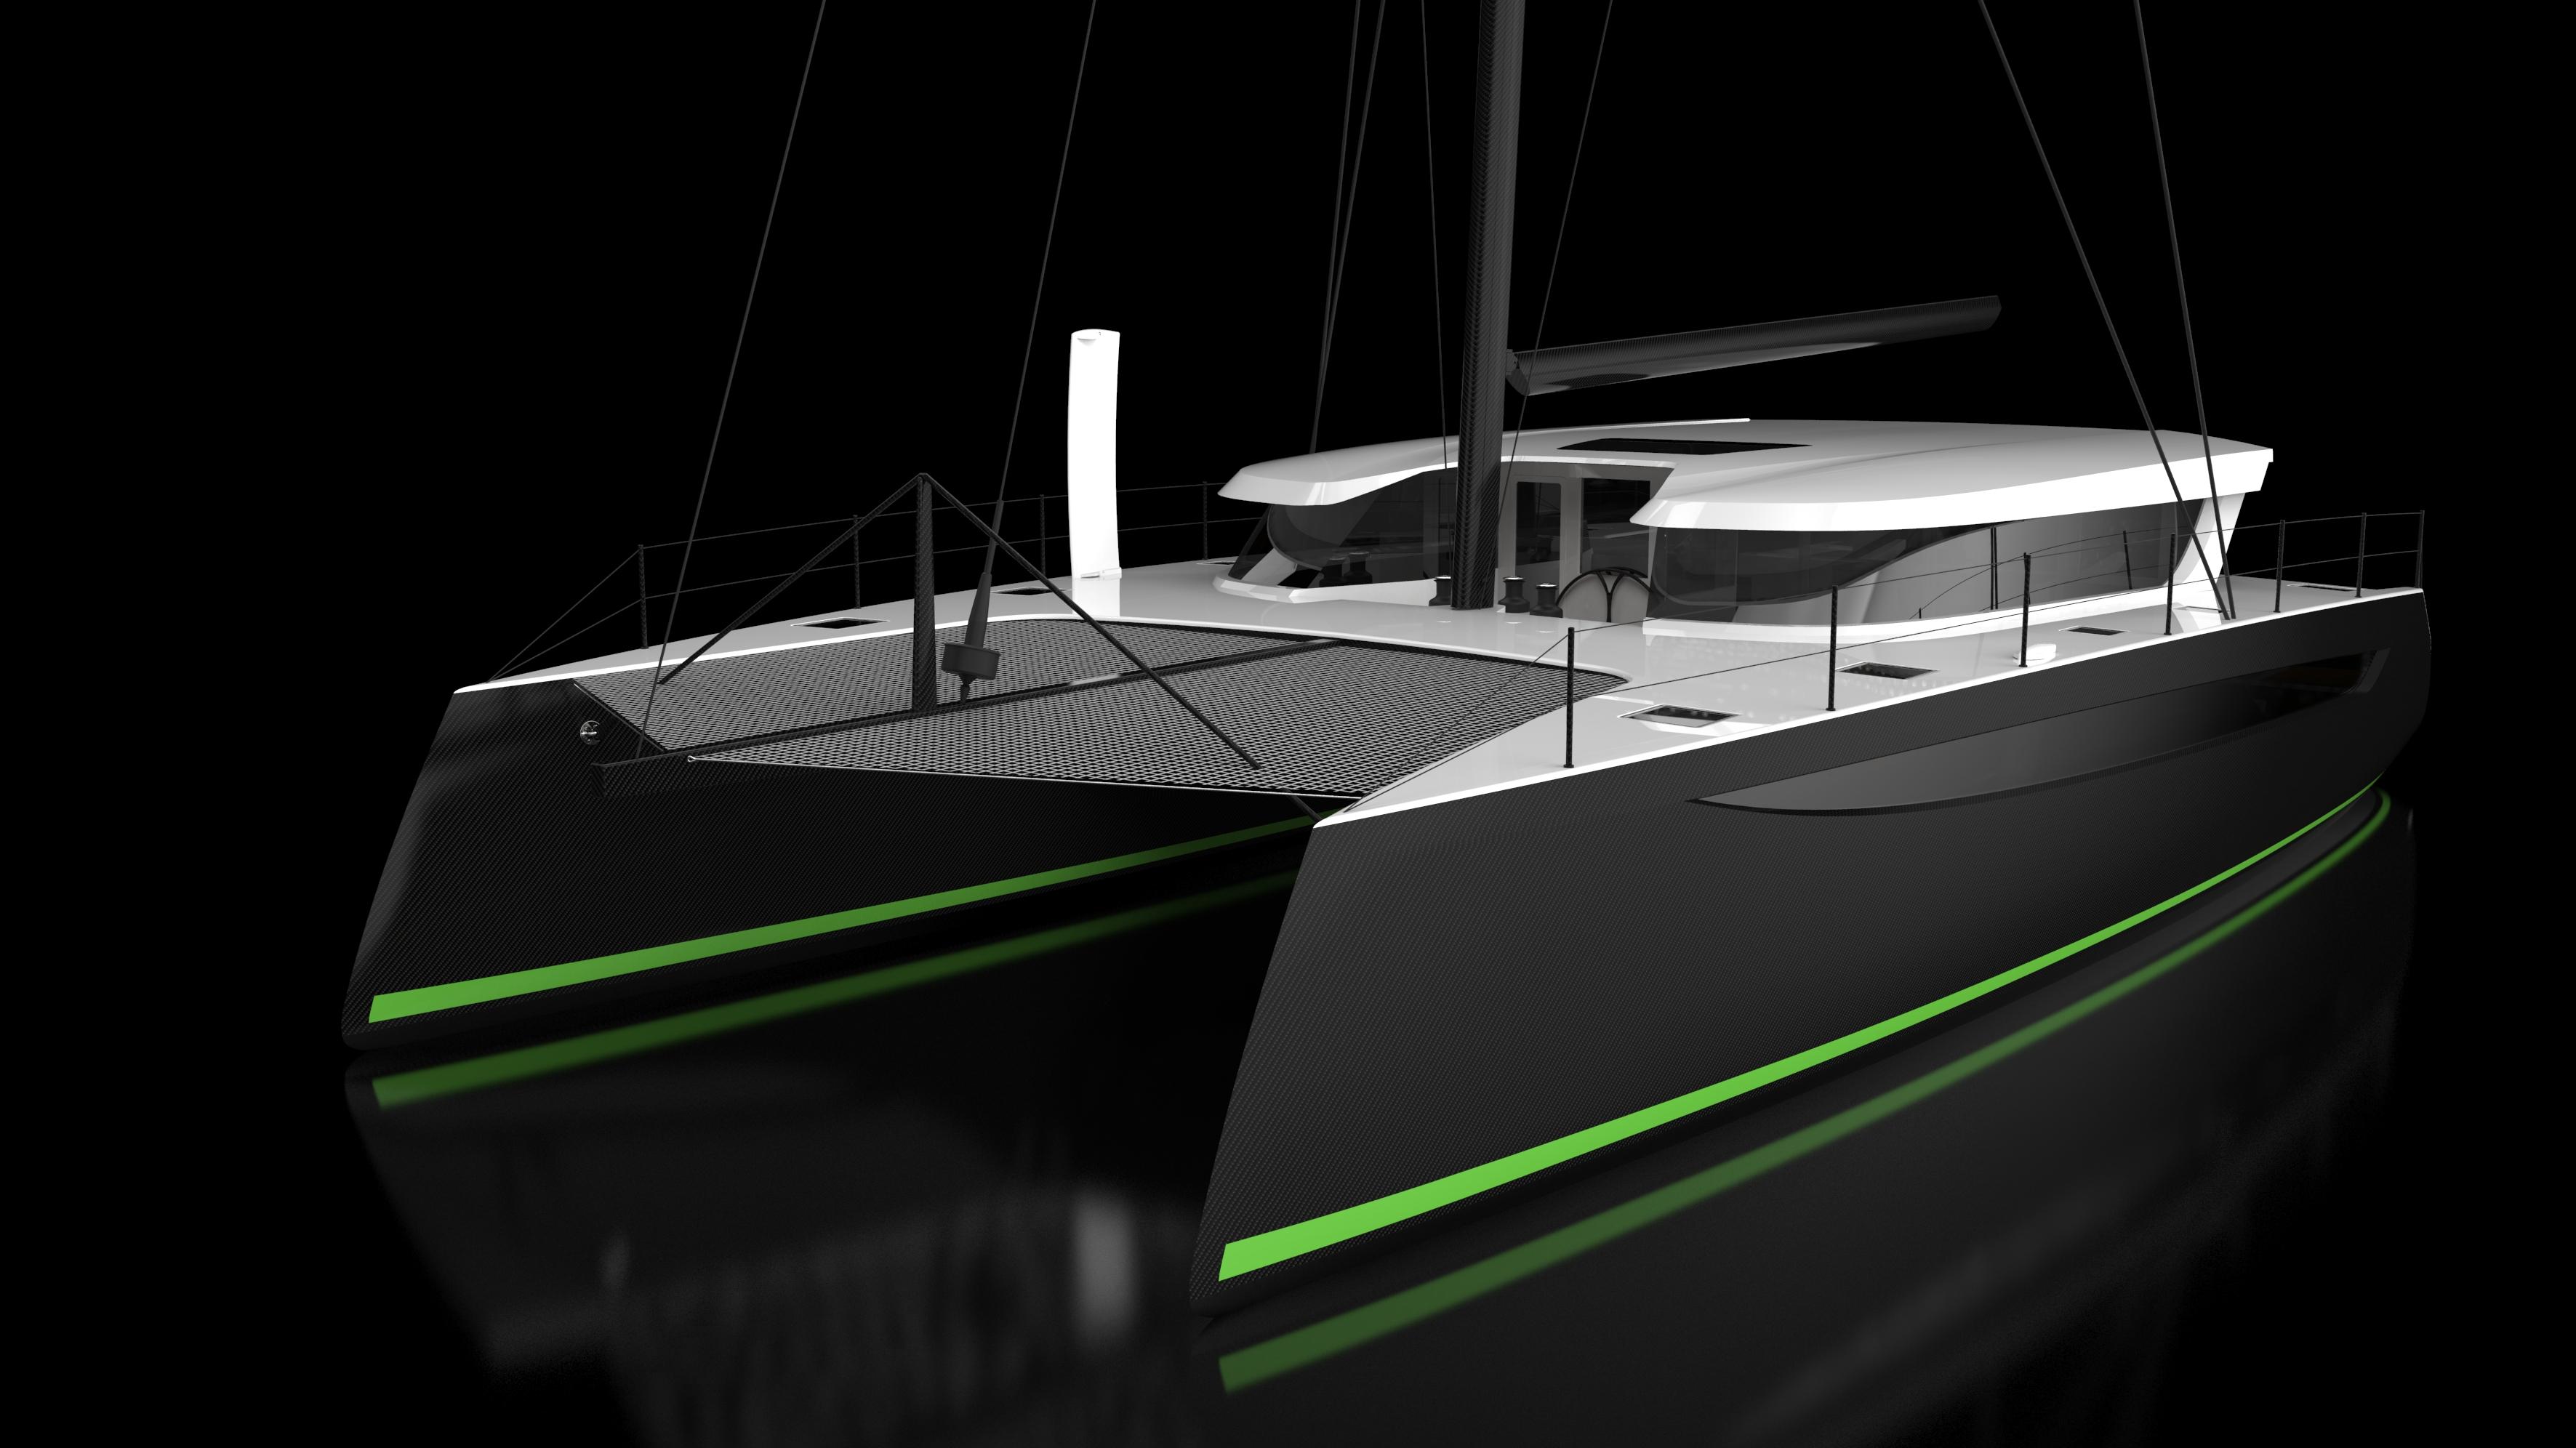 MIAMI BOAT SHOW Carbon Fiber Luxury Performance Catamarans